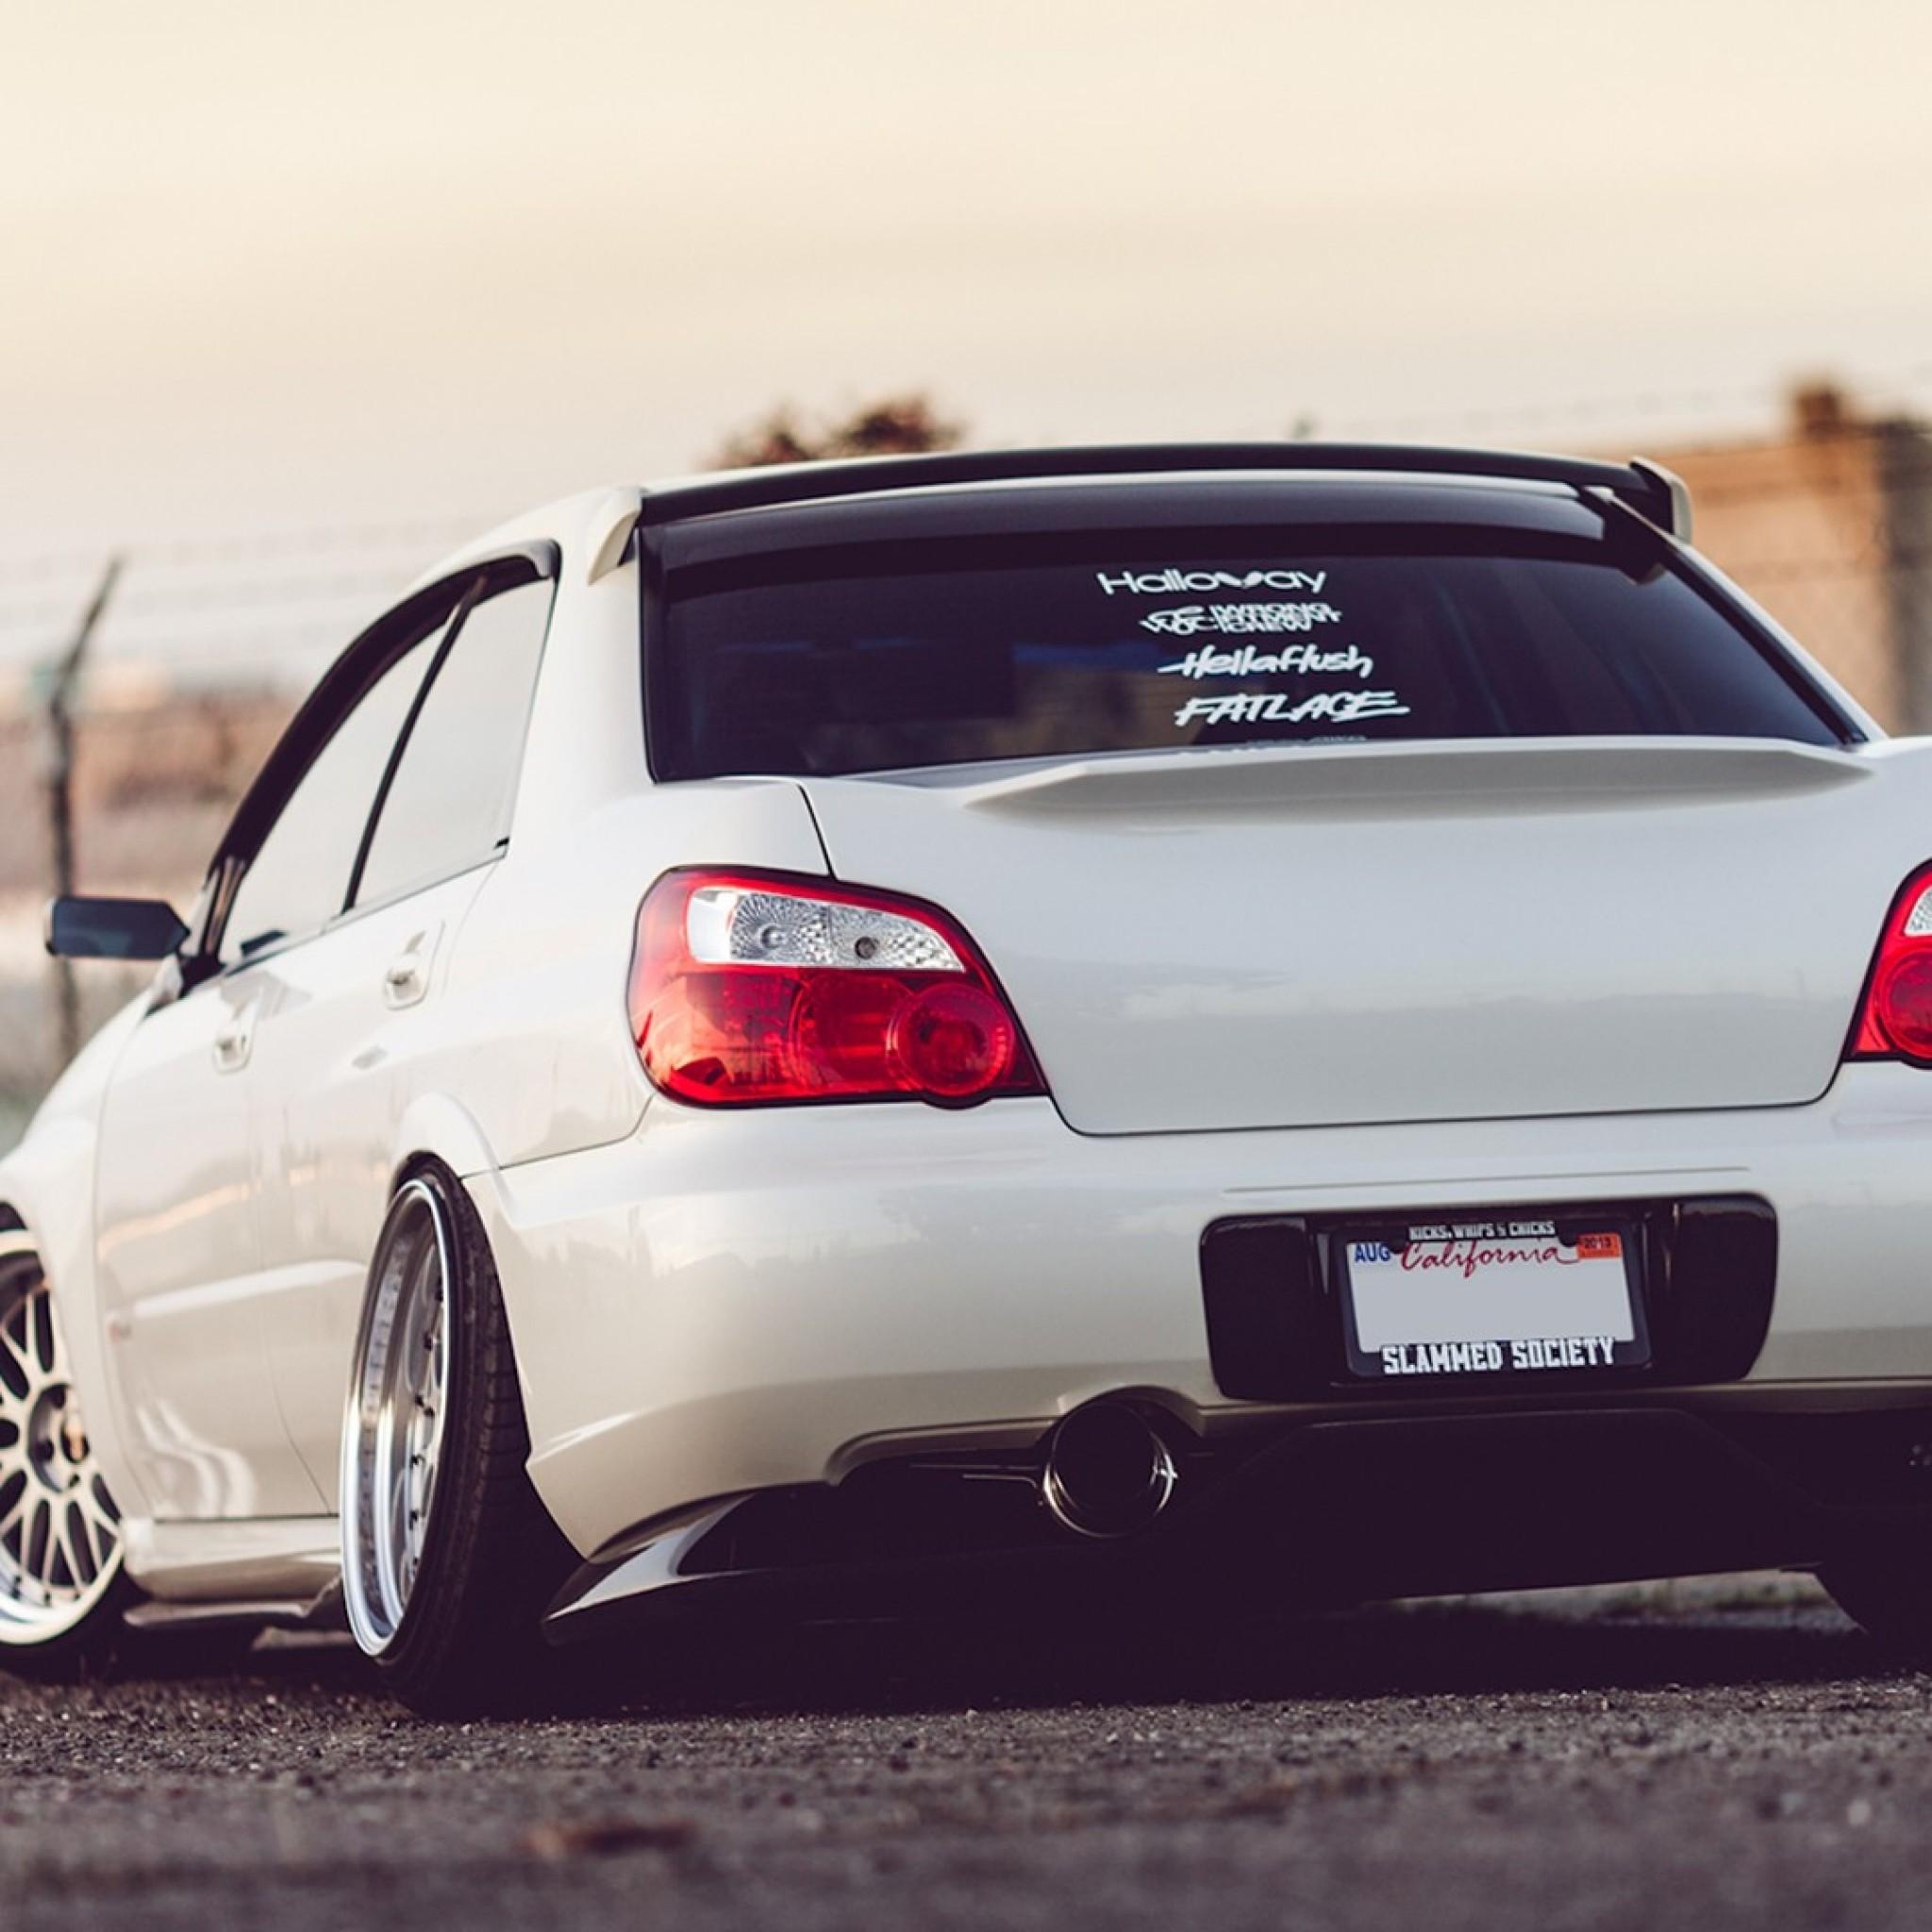 Modified Subaru Sti Wrx >> Subaru Wrx Sti Wallpaper (63+ images)